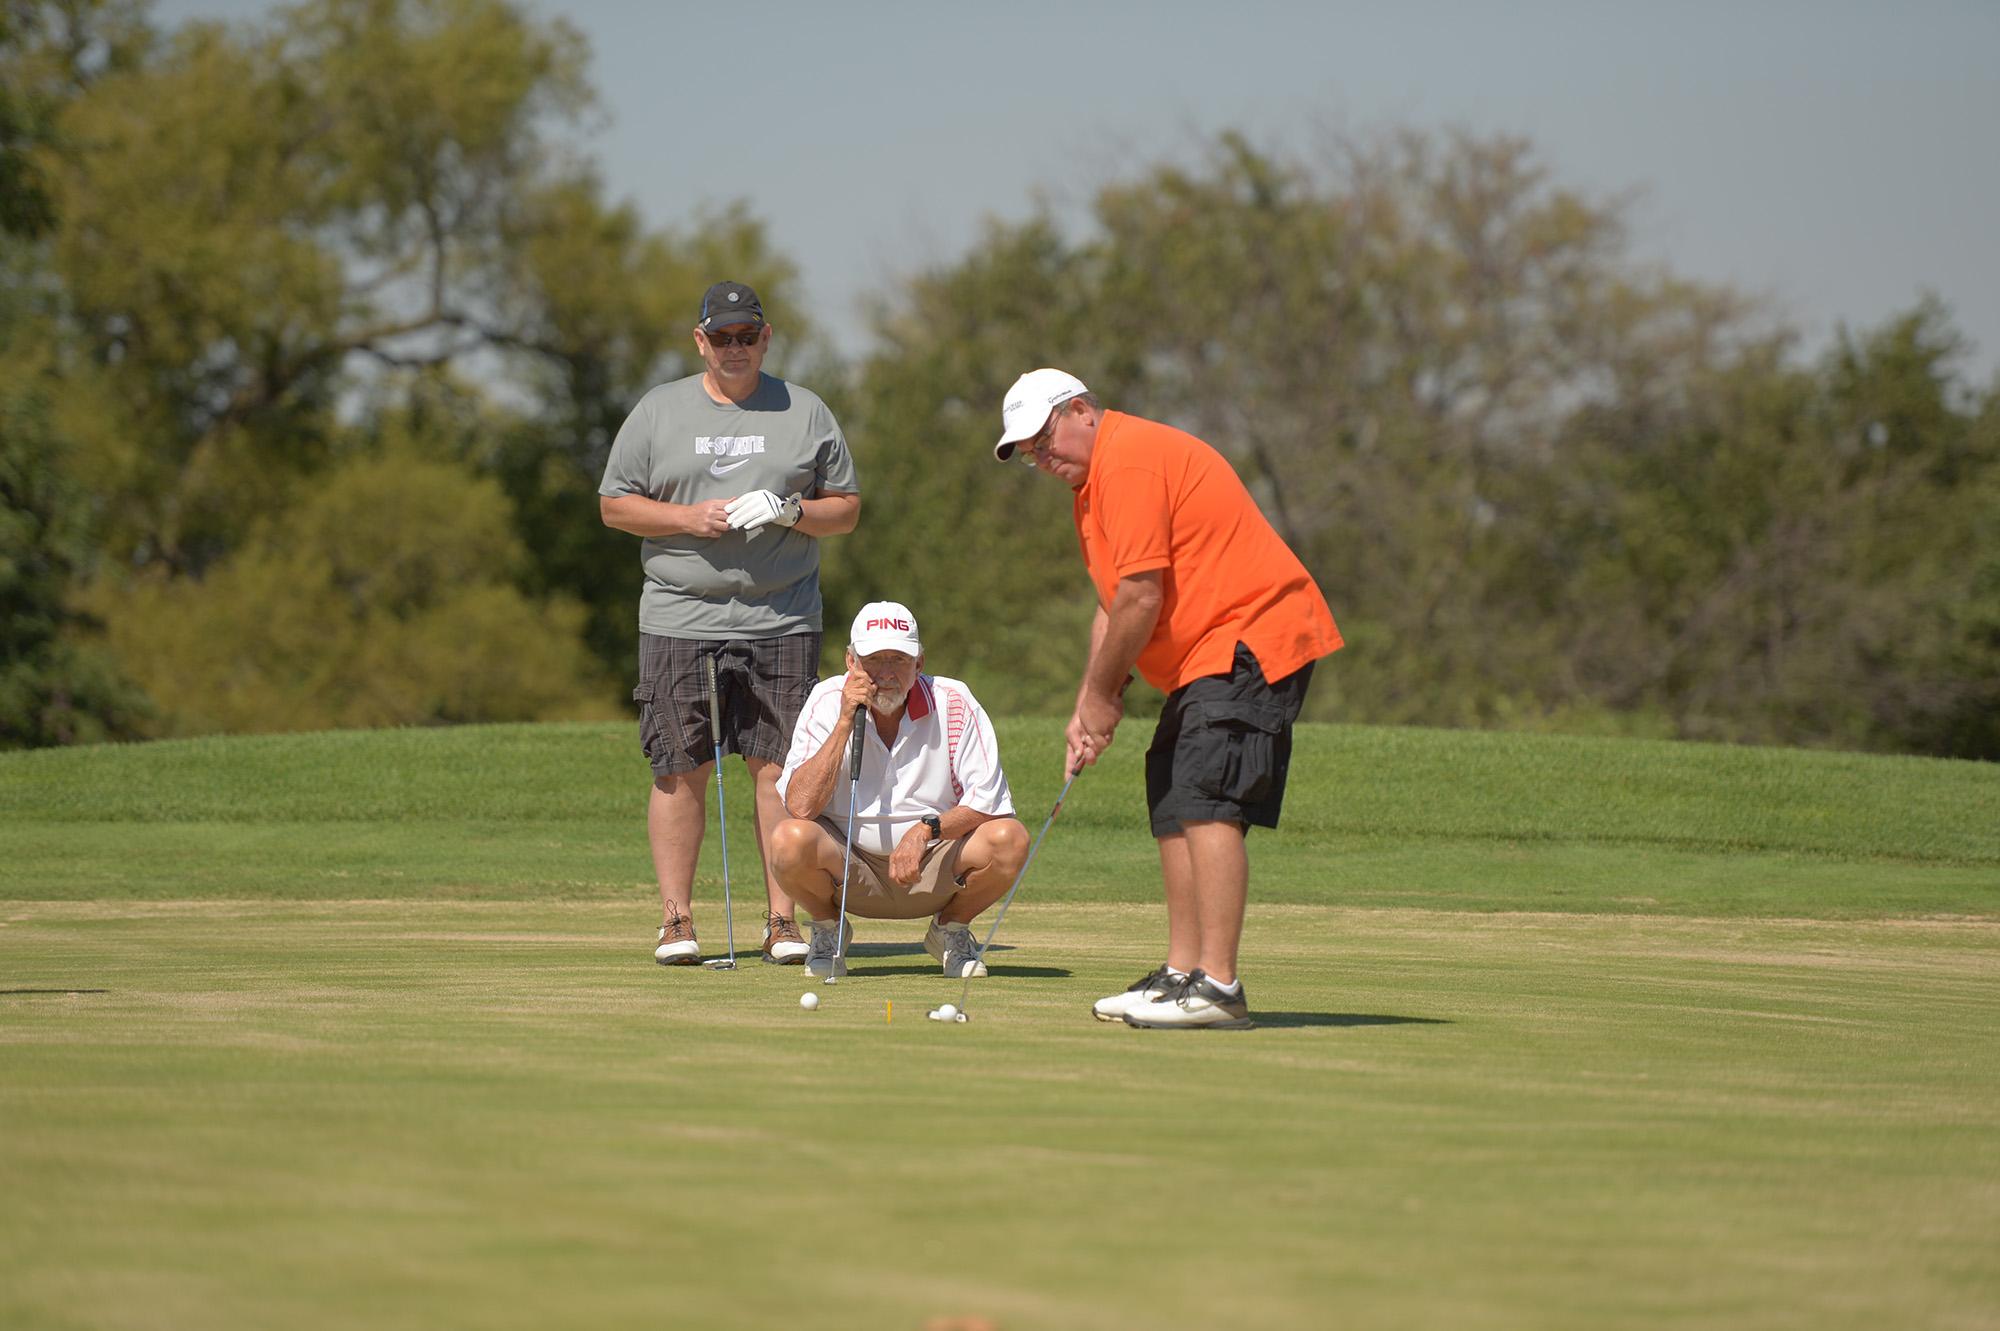 Golf benefit tournament